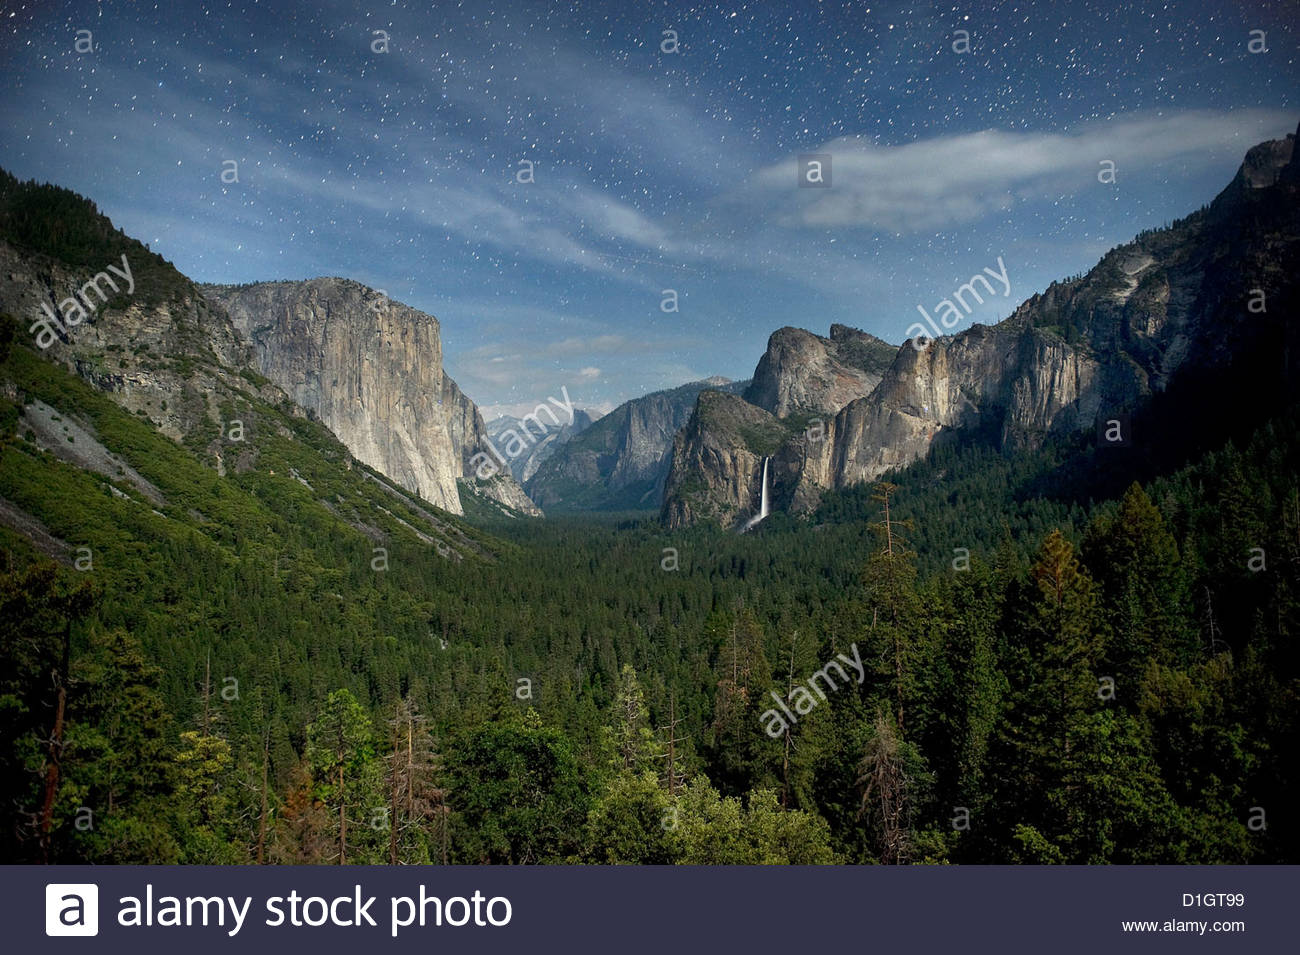 Yosemite Valley and night sky with stars, Yosemite National Park, Yosemite, California, United States of America, - Stock Image